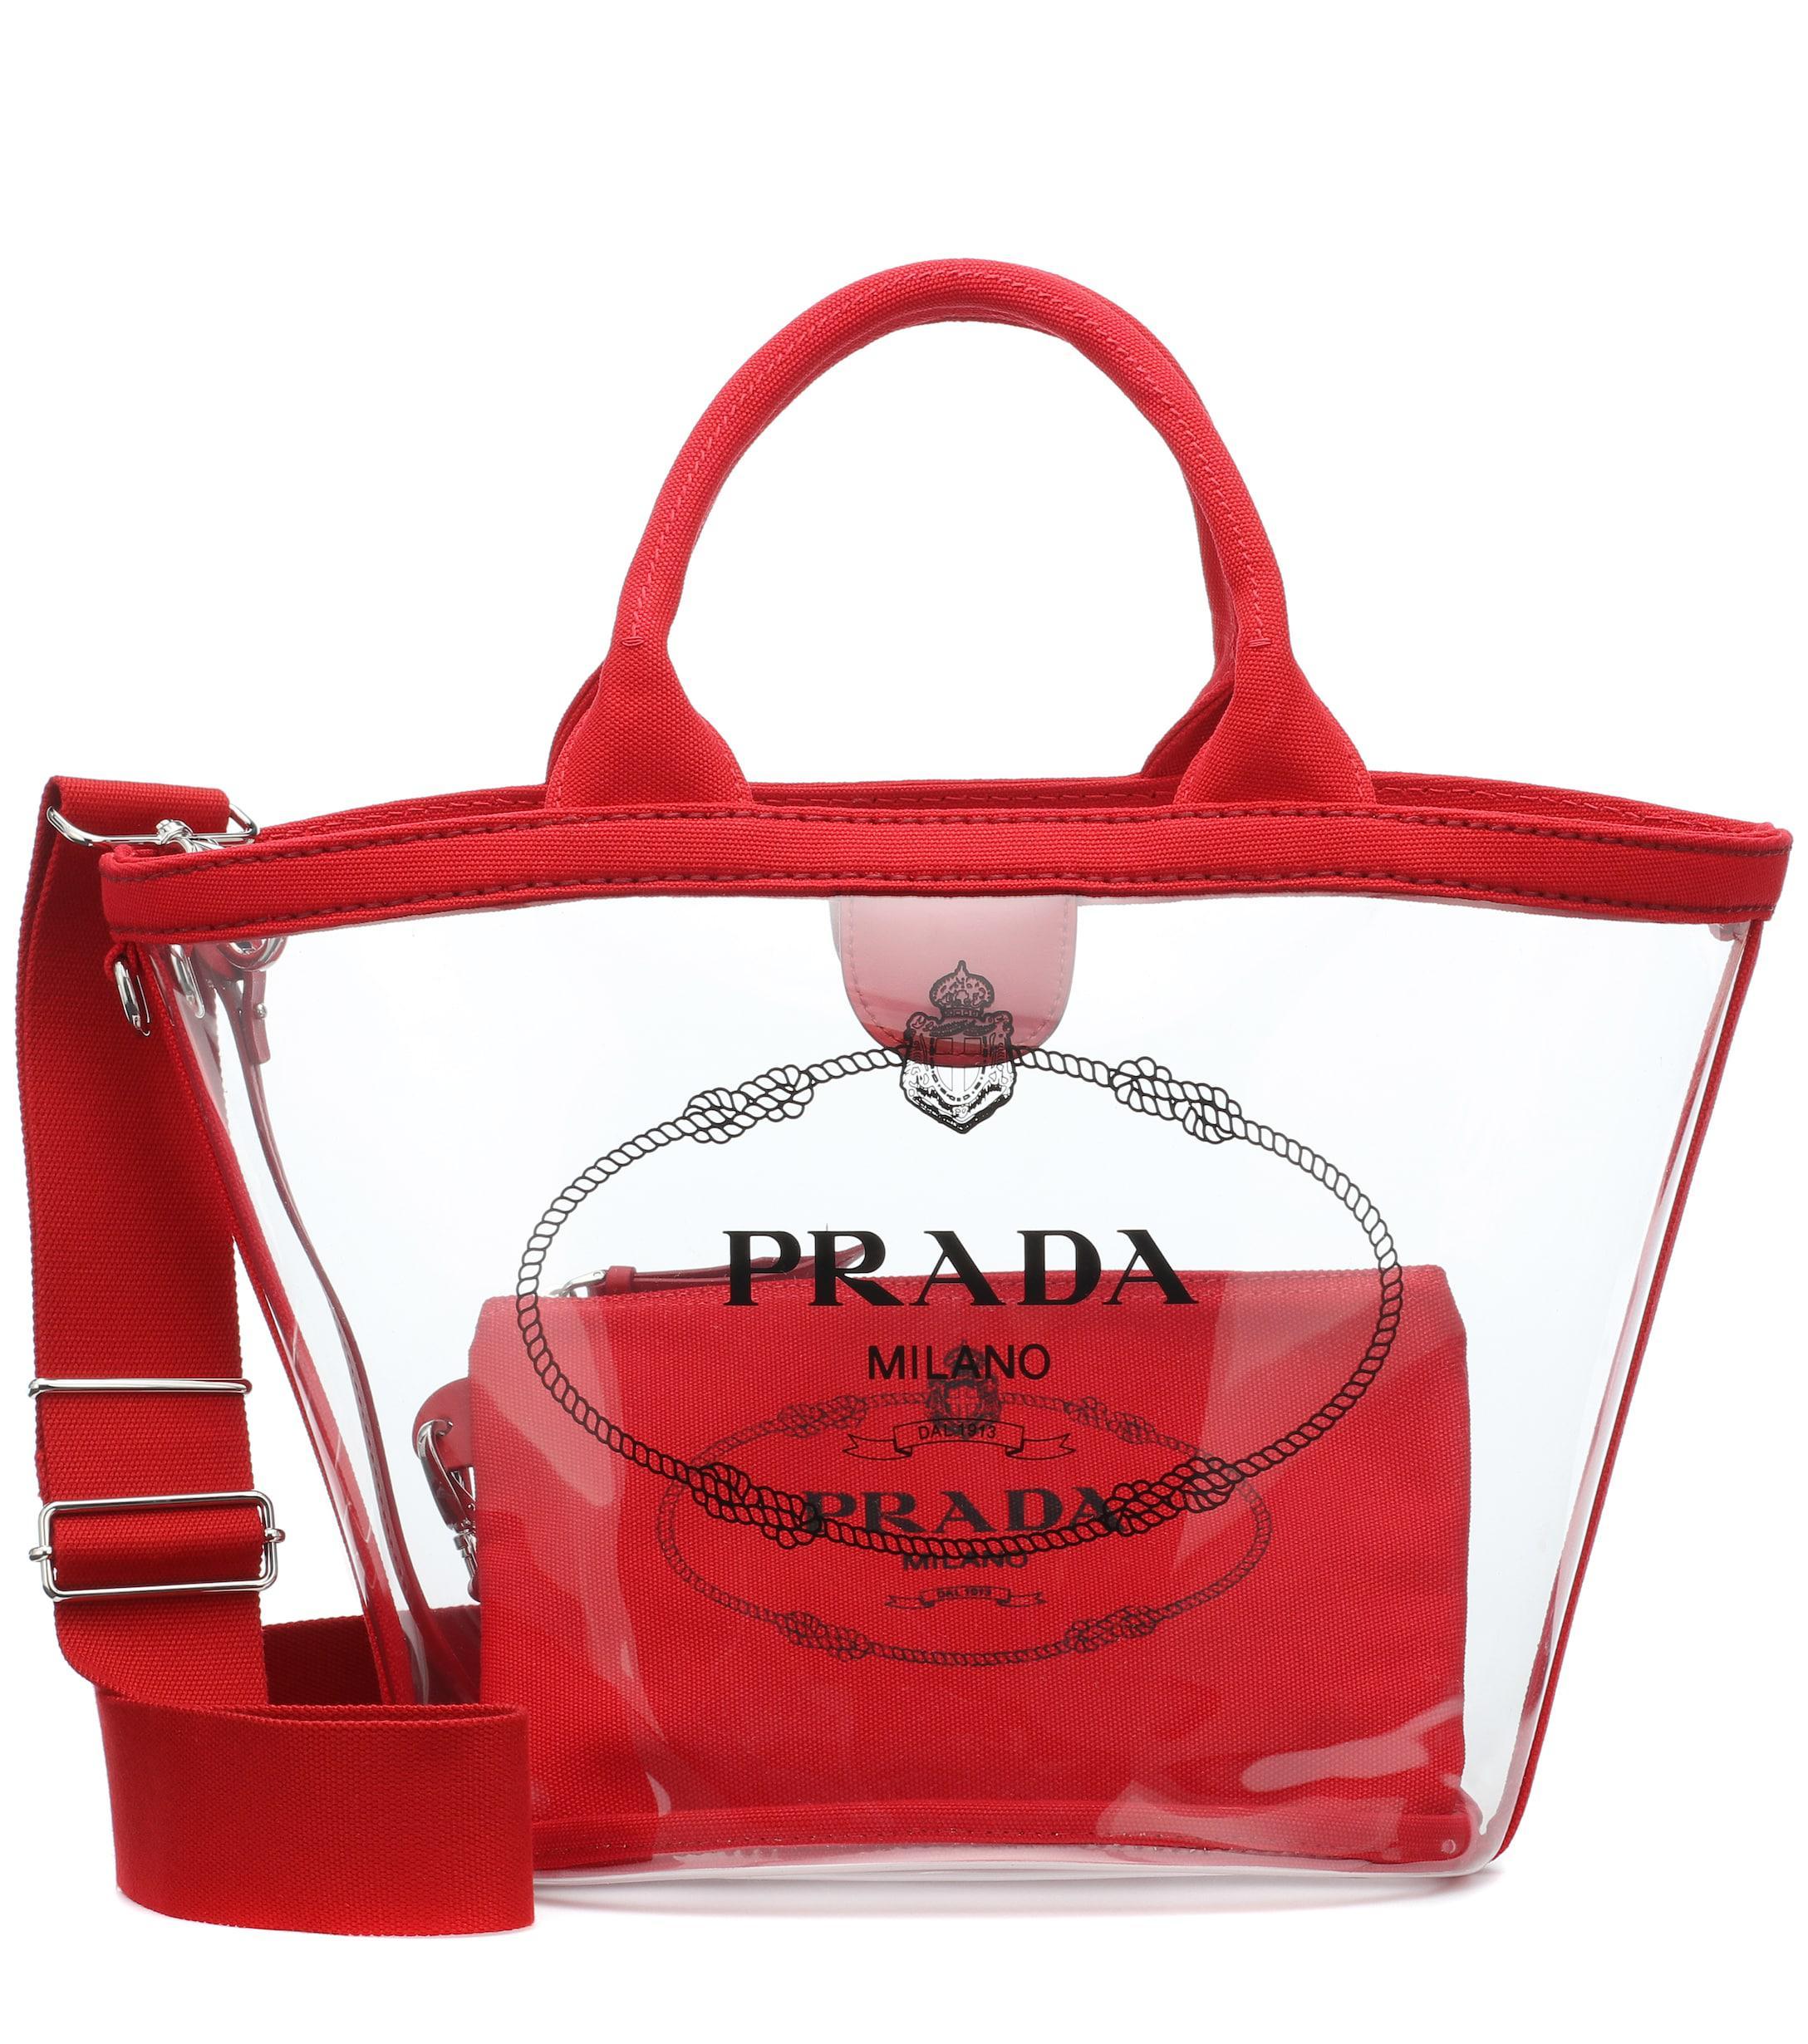 594885e4c89d Prada - Red Transparent Shopper - Lyst. View fullscreen